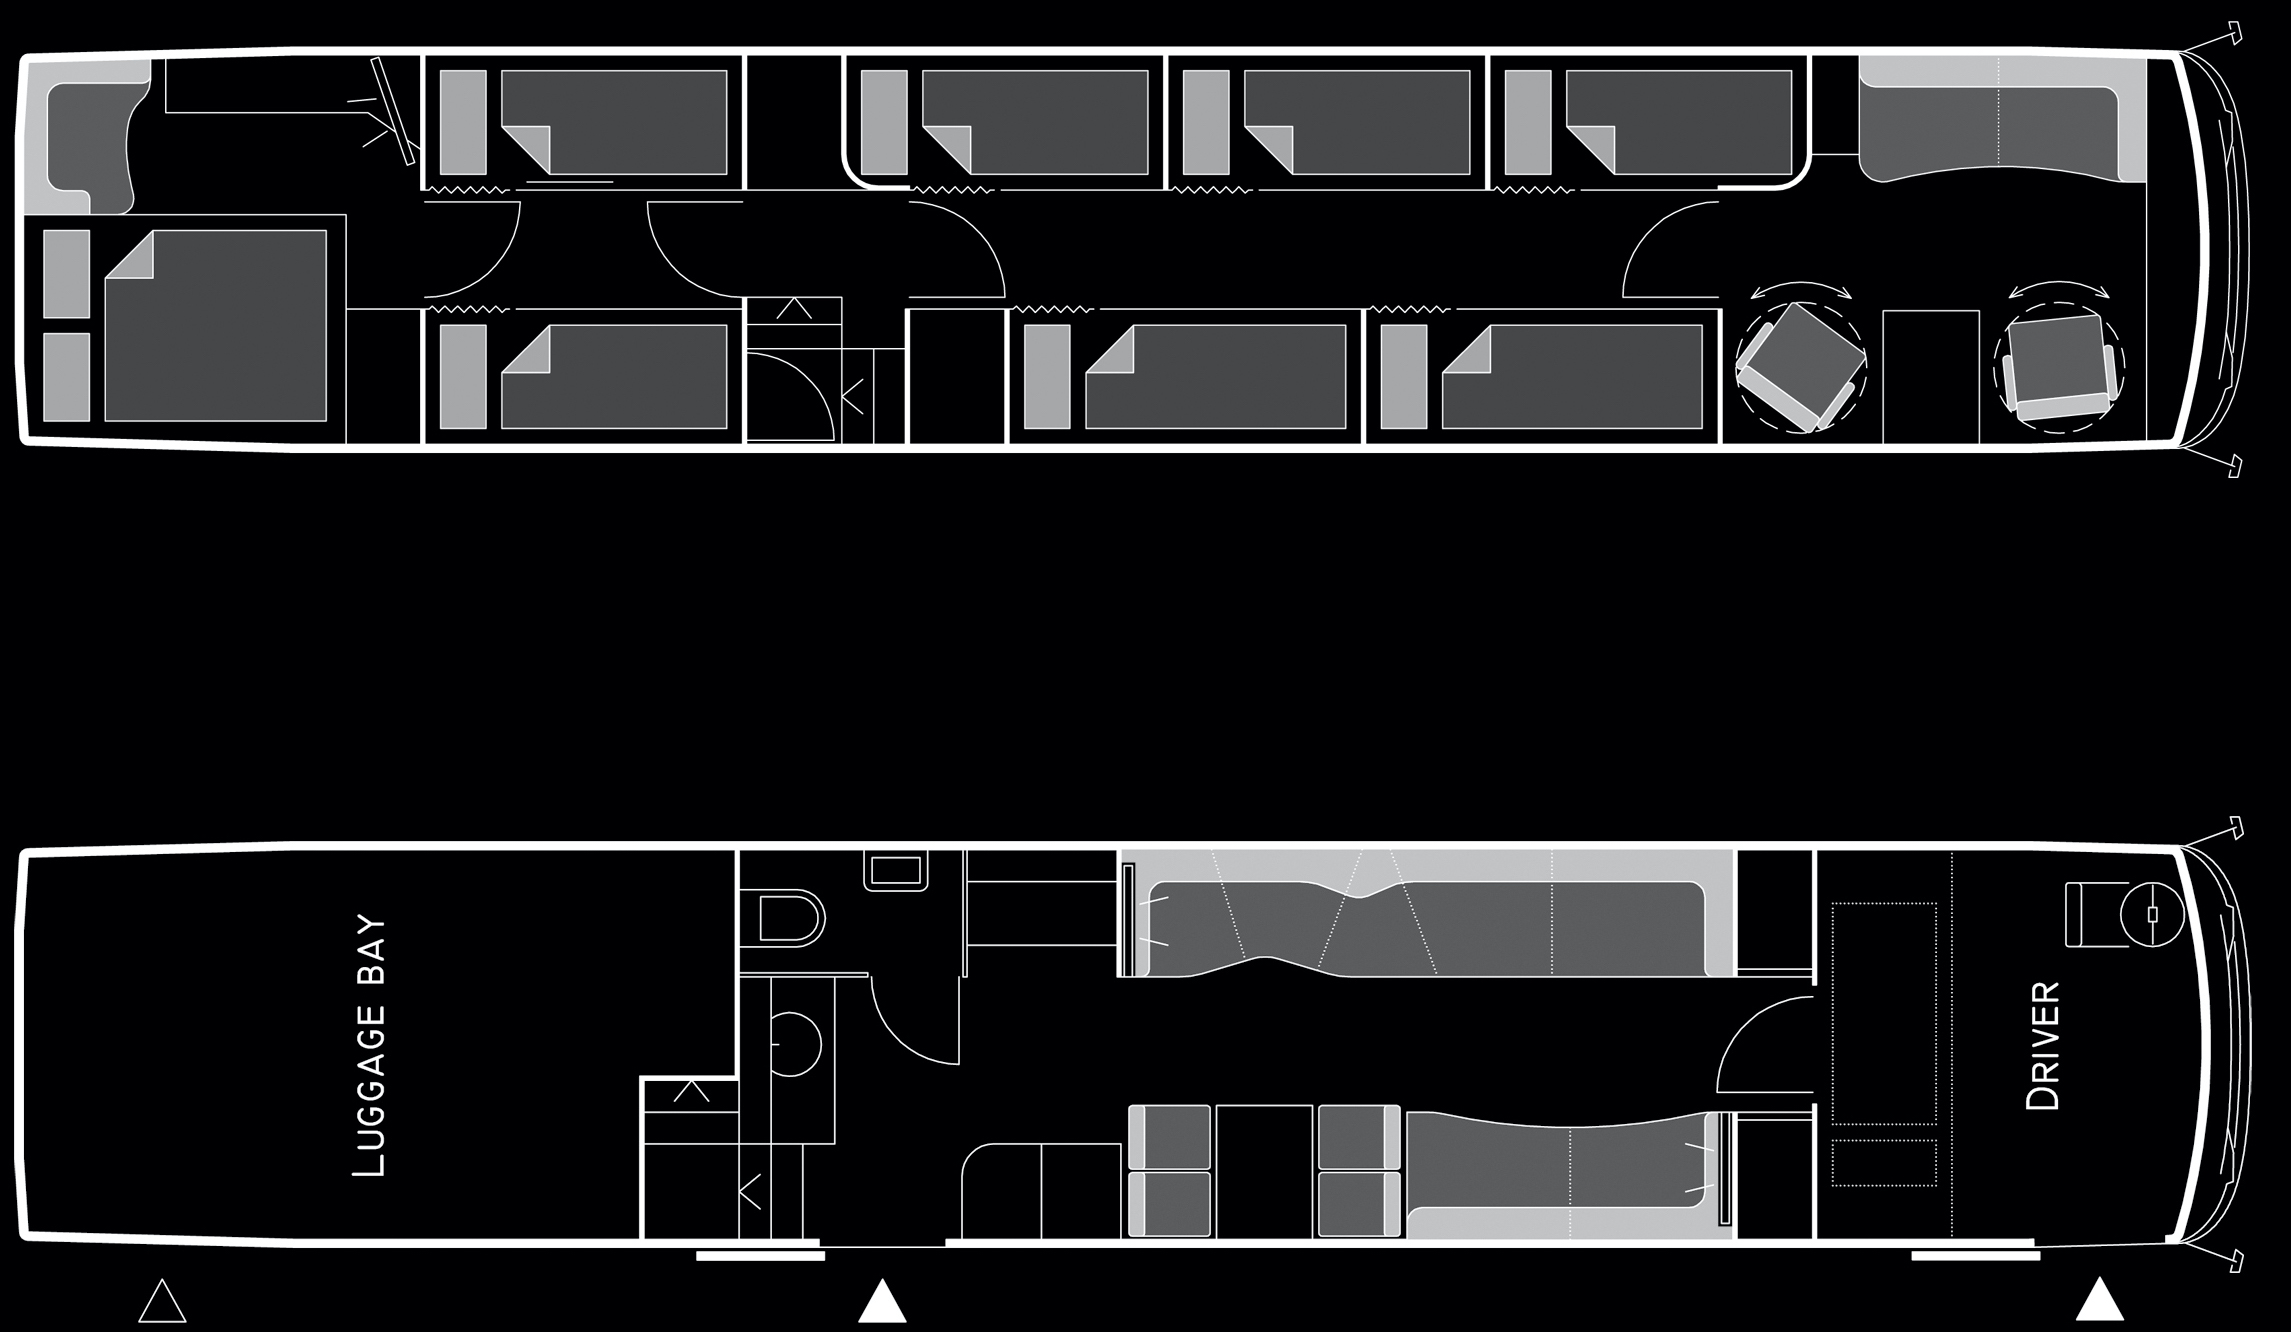 Beat the Street - Setra Doubledeckers 14 Bunks Floor Plan